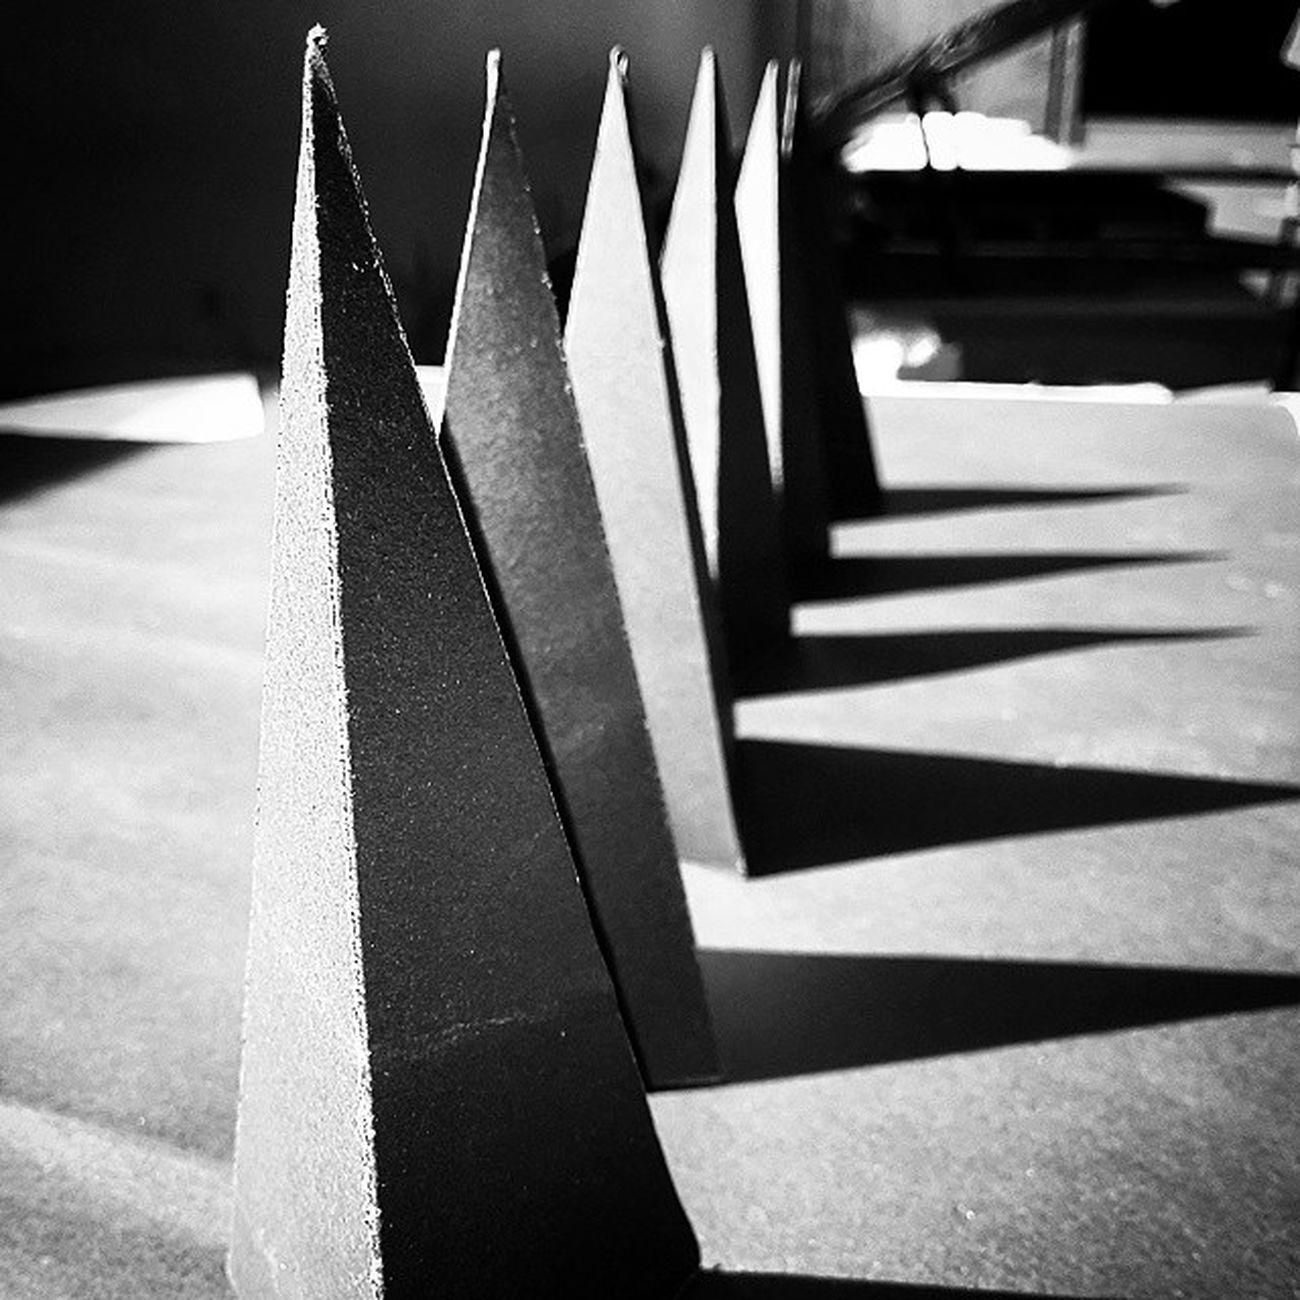 Architectural Designs! Notmine 😅 JustClikedByMe 😆 Blaknwhite 😎 Dphotography 😘